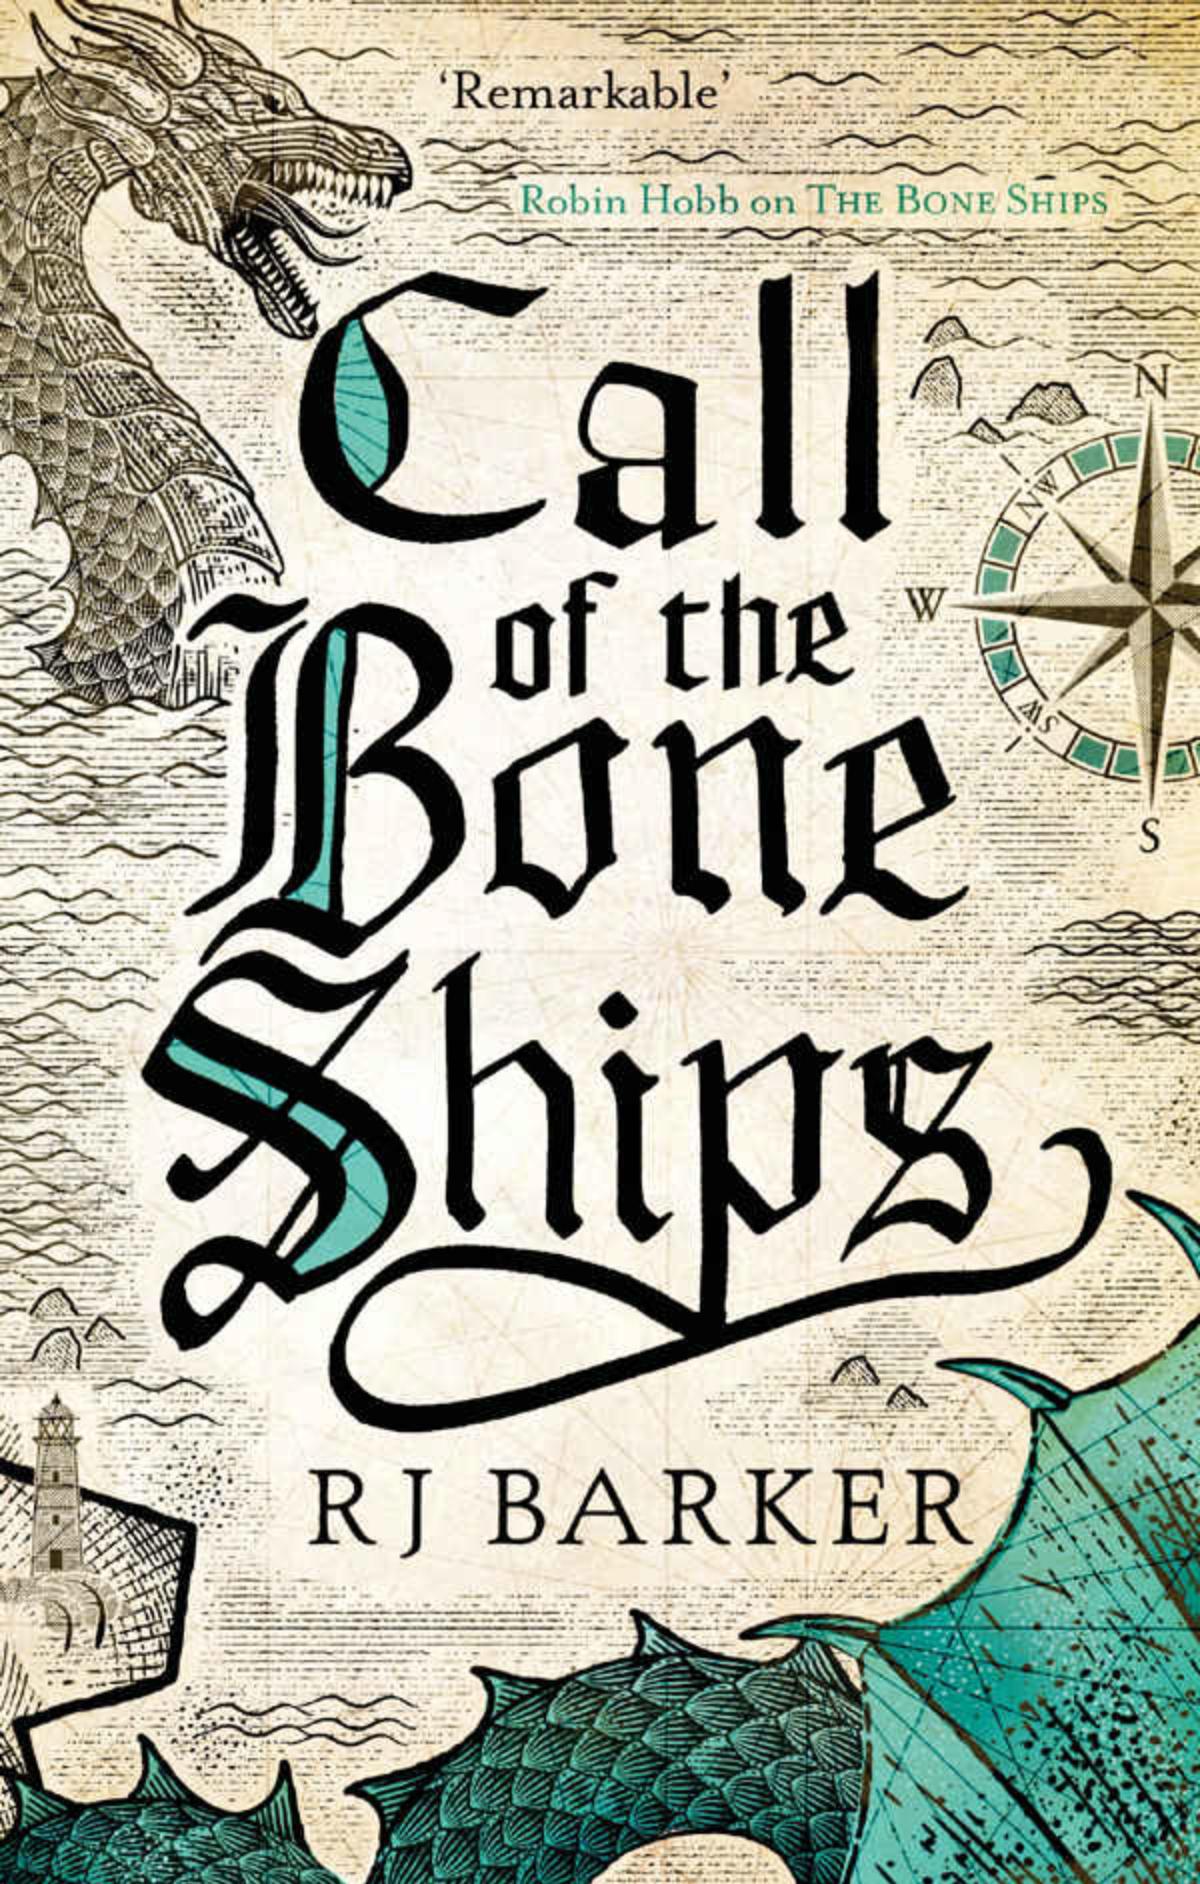 RJ Barker - Call of the Bone Ships - Cover